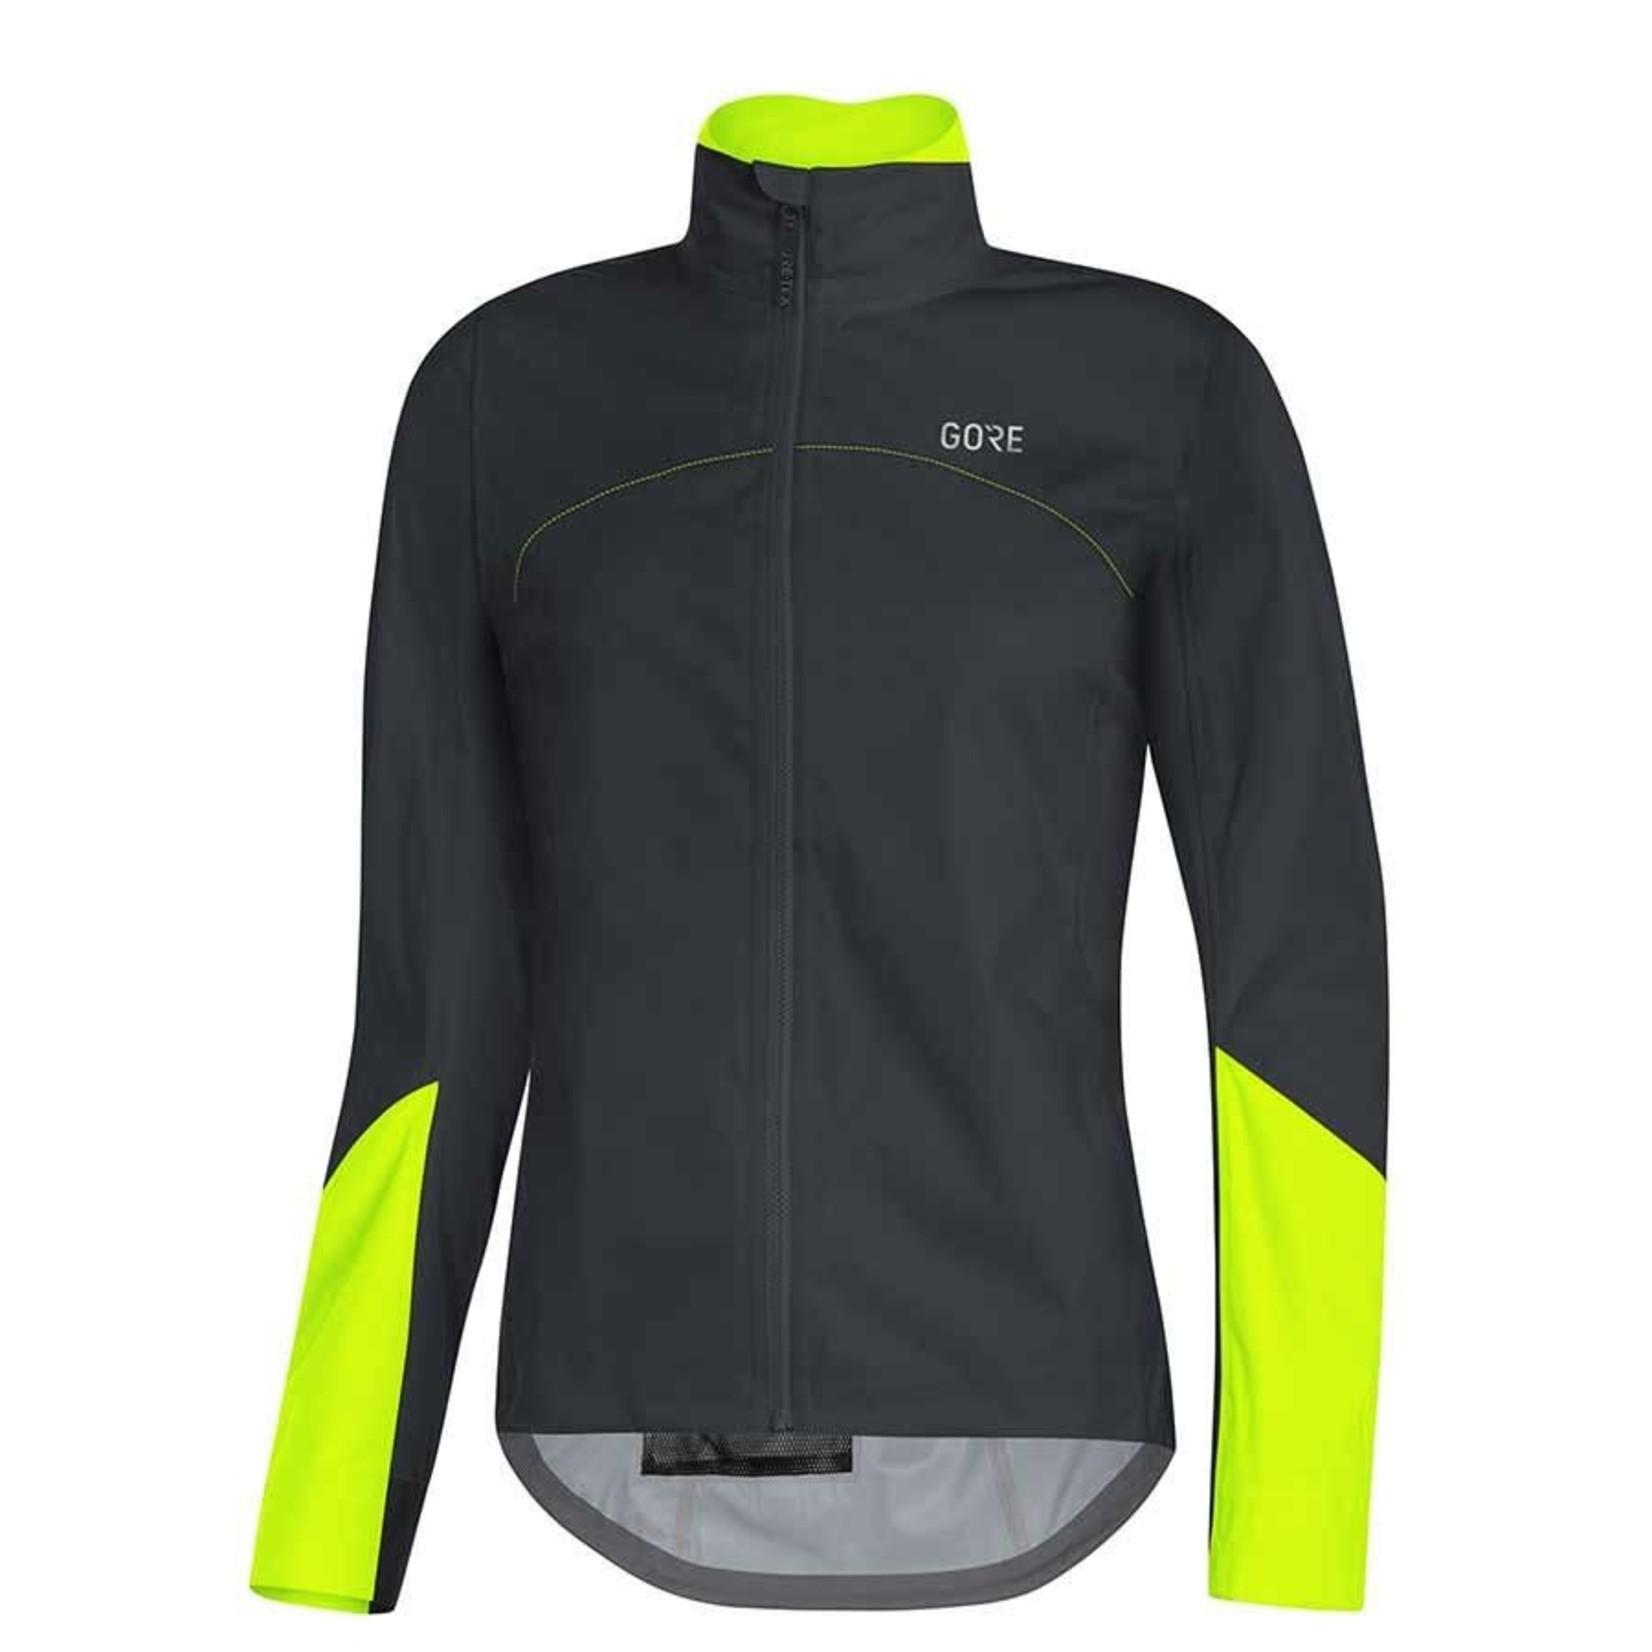 Gore Wear Gore Wear C5 Active Jacket